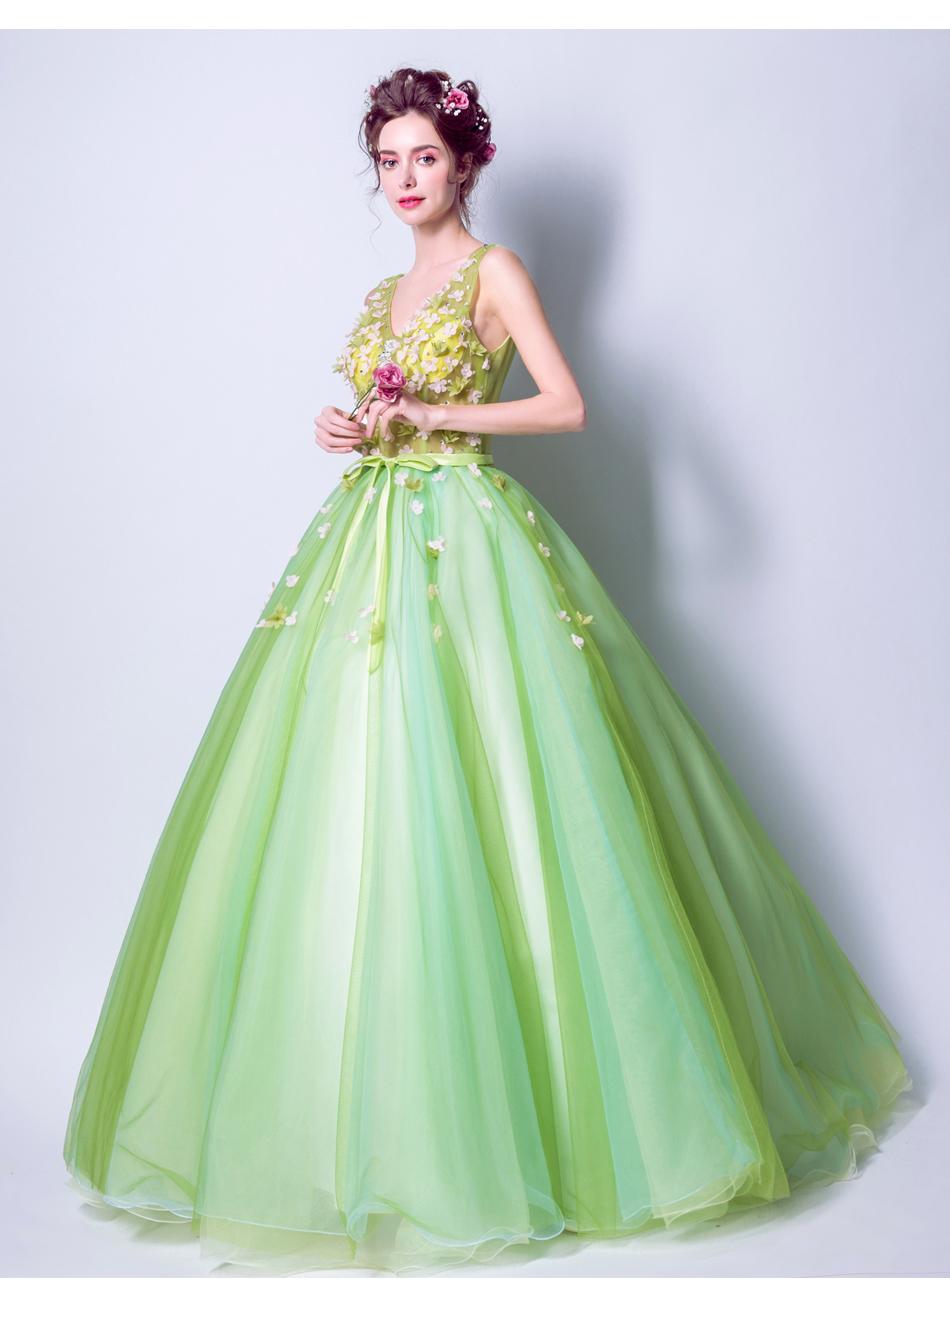 Angel Wedding Dress Marriage Bride Bridal Gown Vestido De Noiva 2017Soft powder, Qingjian Lvxian beauty, petals, green 9718 17